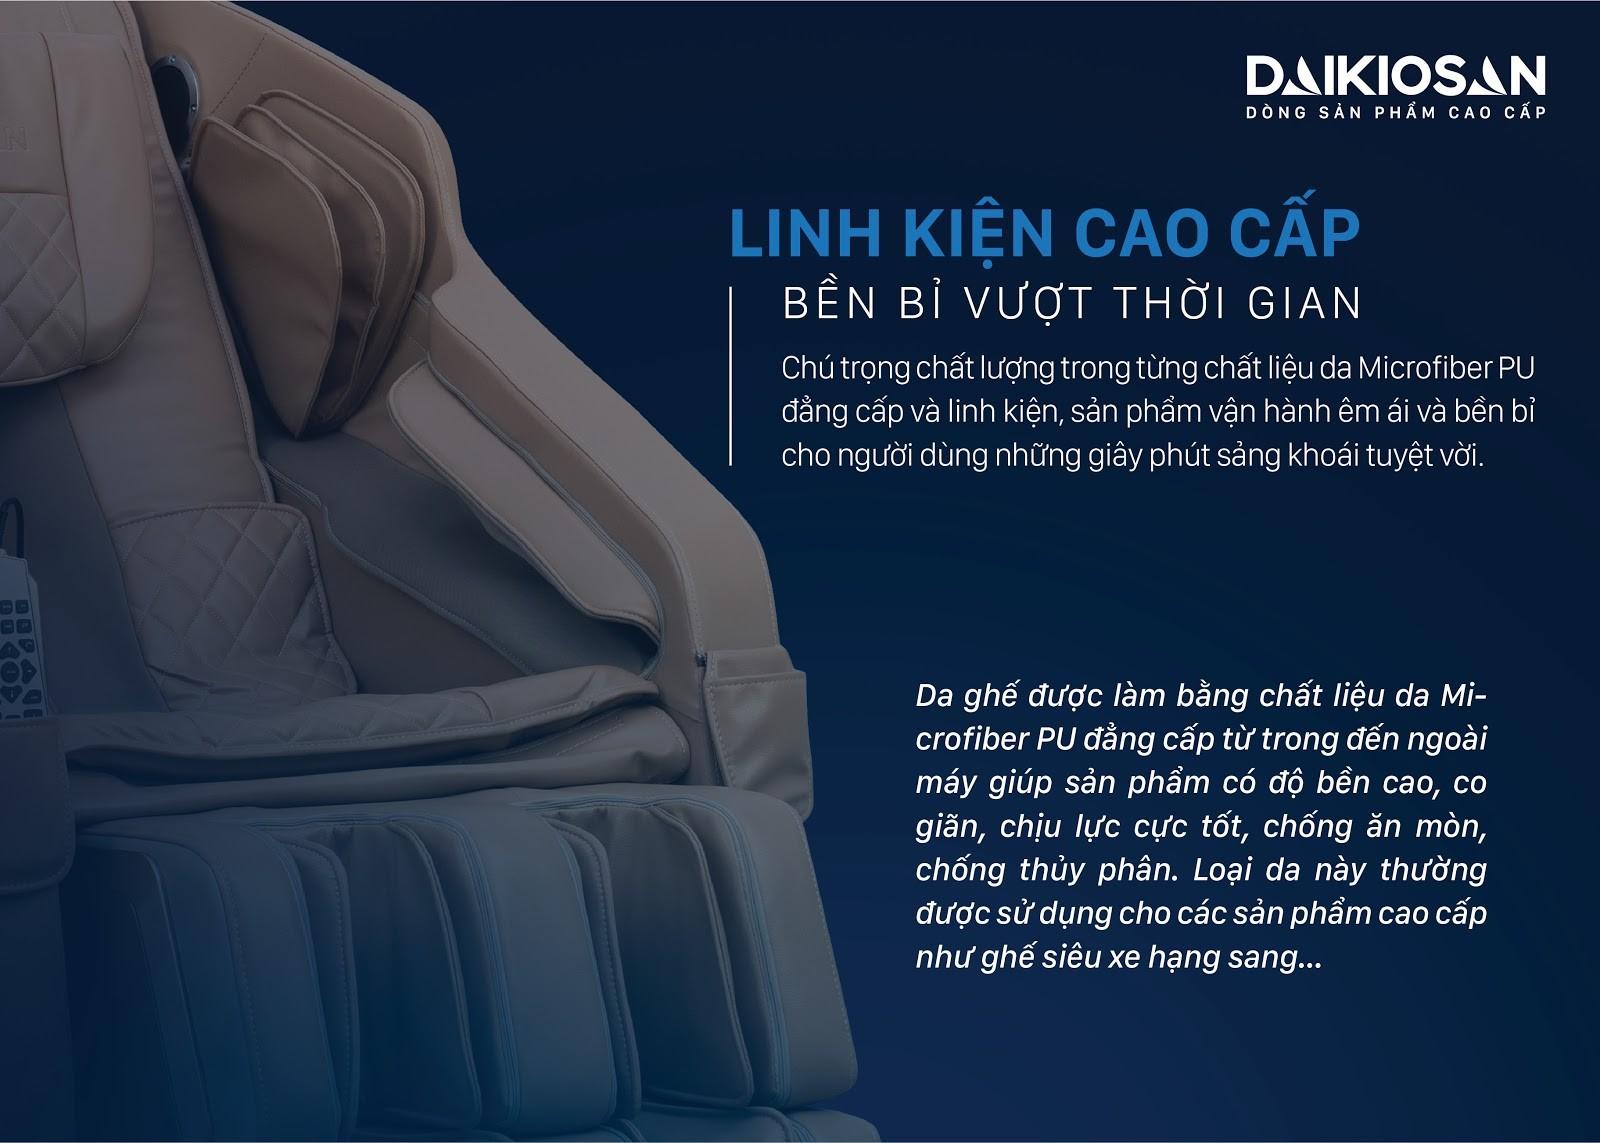 Ghế massage Daikiosan sở hữu chất liệu ghế cao cấp